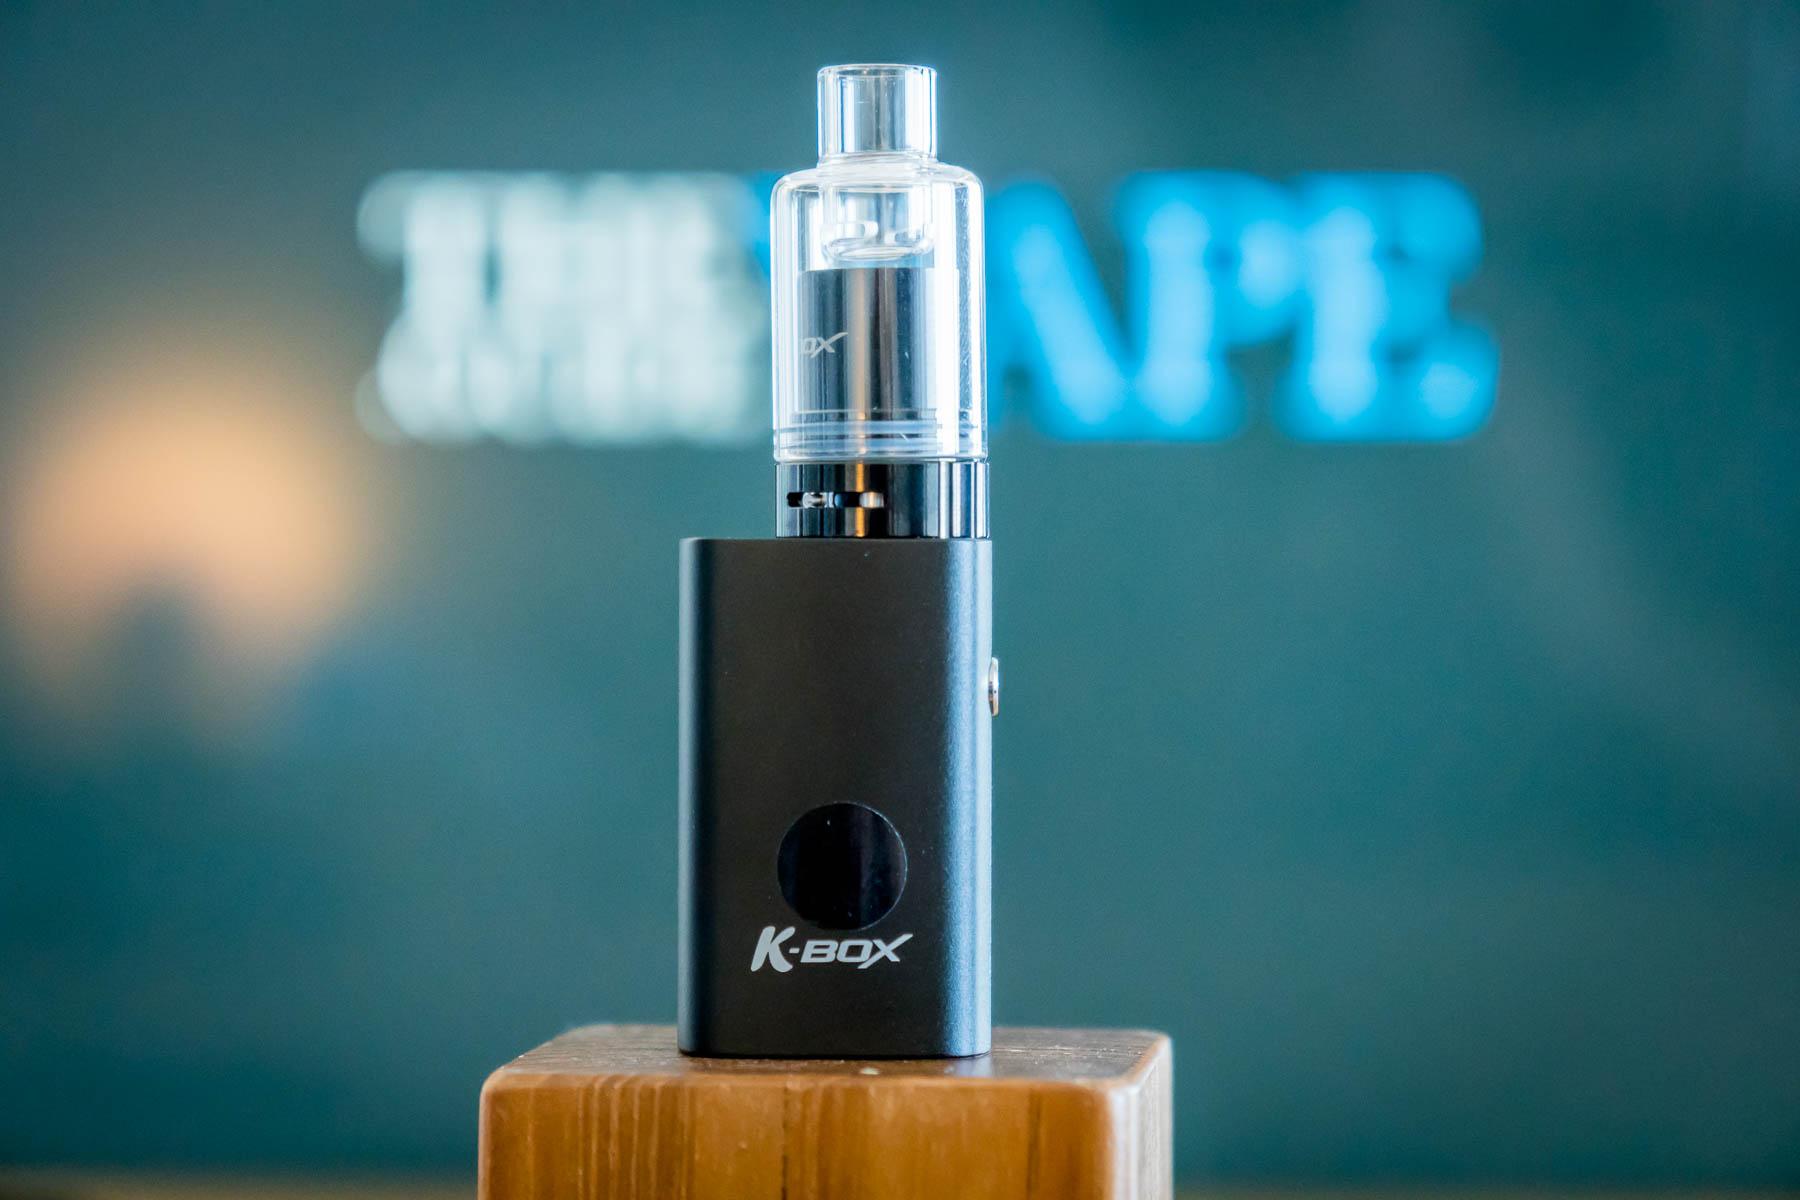 KandyPens K-Box Review: An Intense Box-style Wax Vaporizer